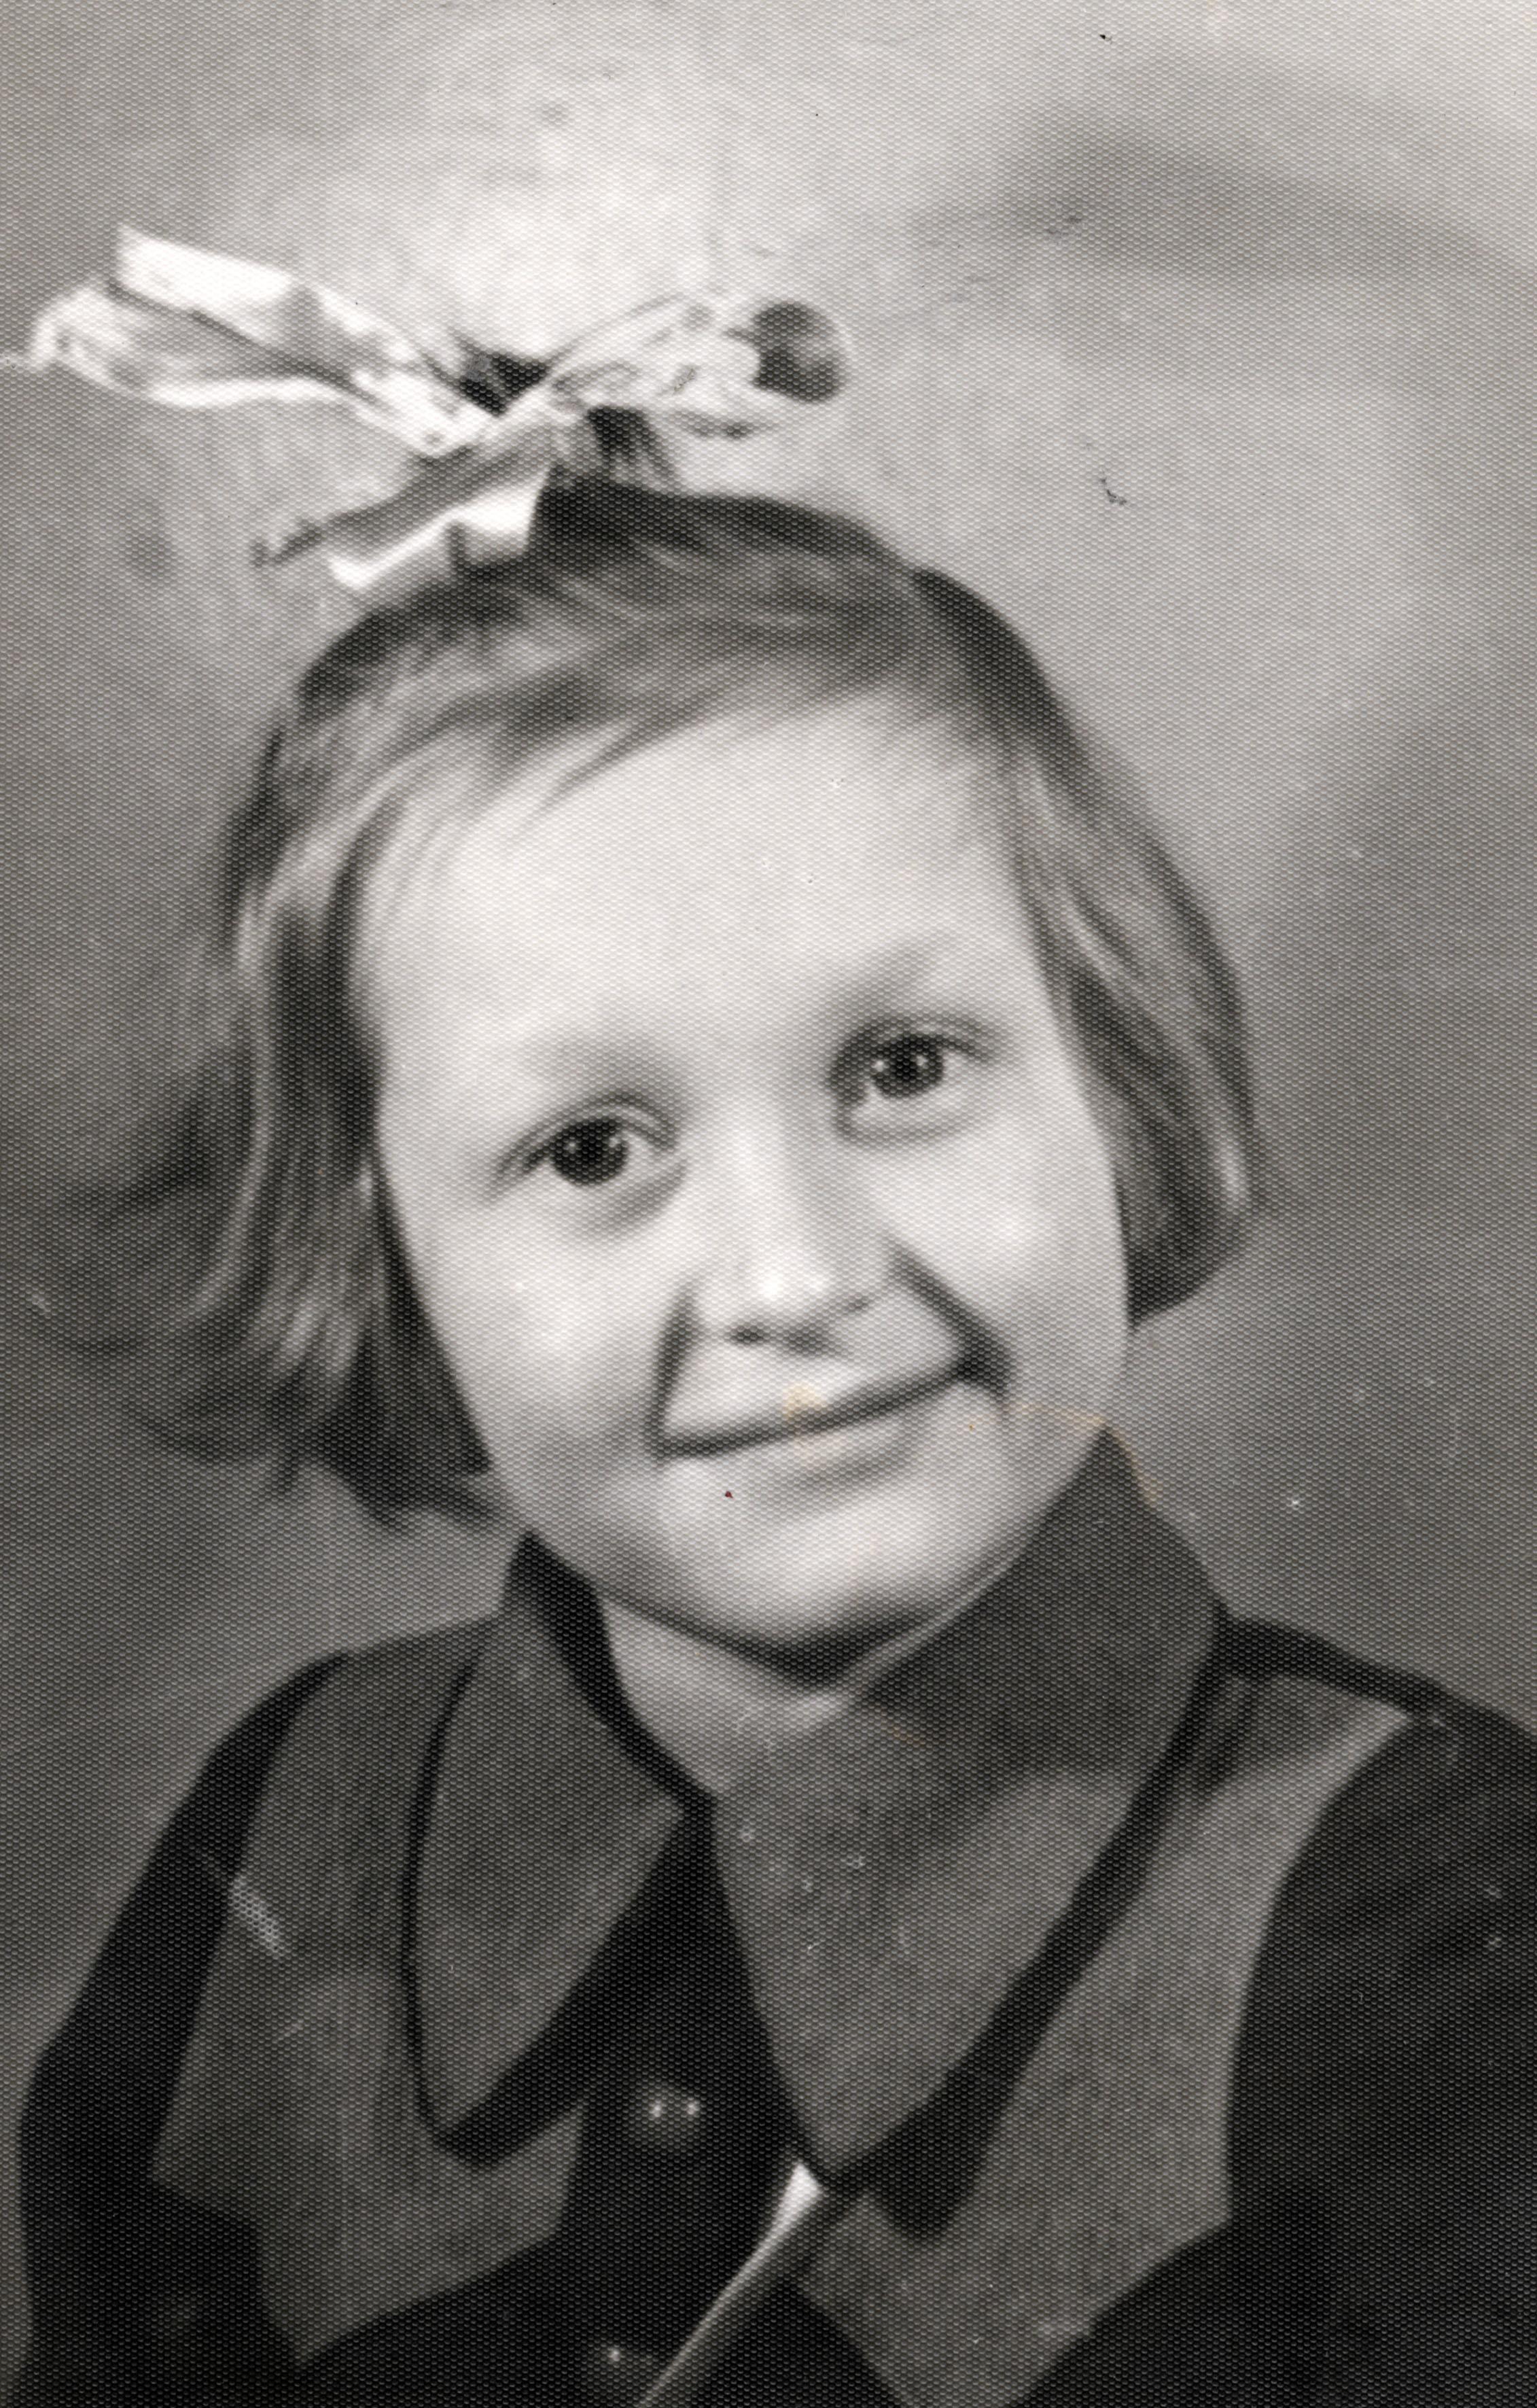 Franziska Smolka als Kindergartenkind in Moskau